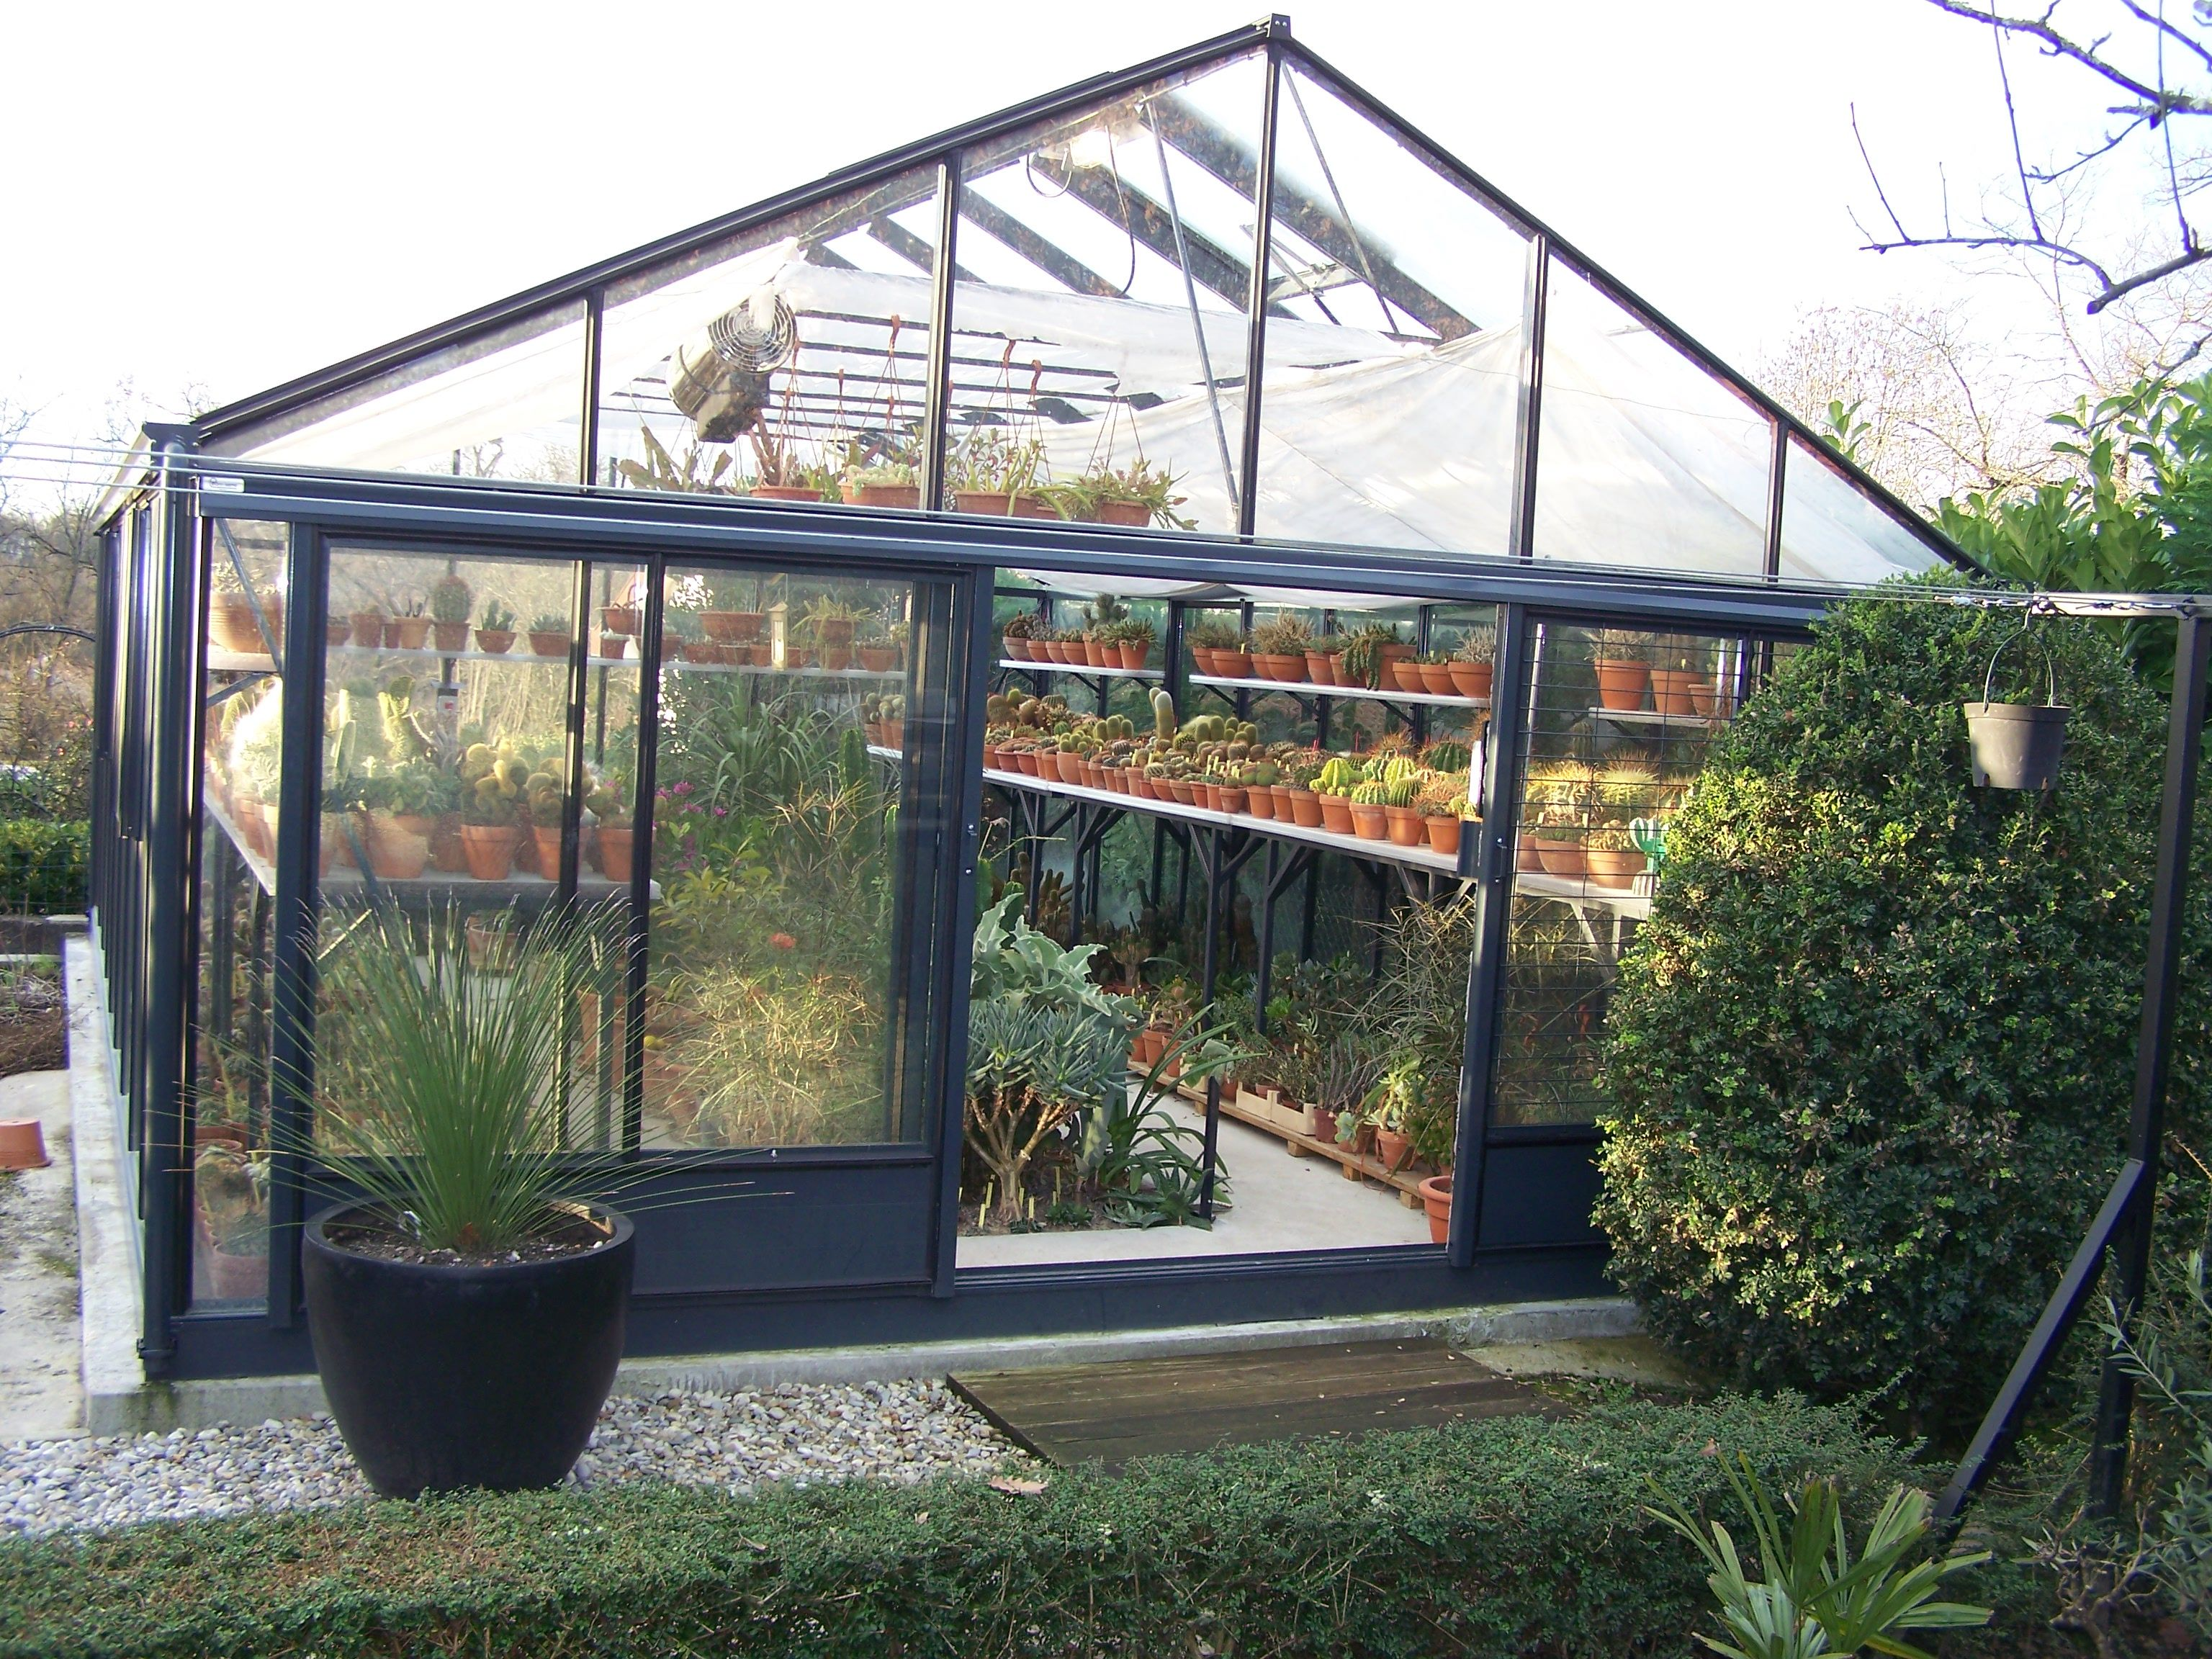 serre euro plus serres aluminium verre polycarbonate pinterest serre en verre serre. Black Bedroom Furniture Sets. Home Design Ideas